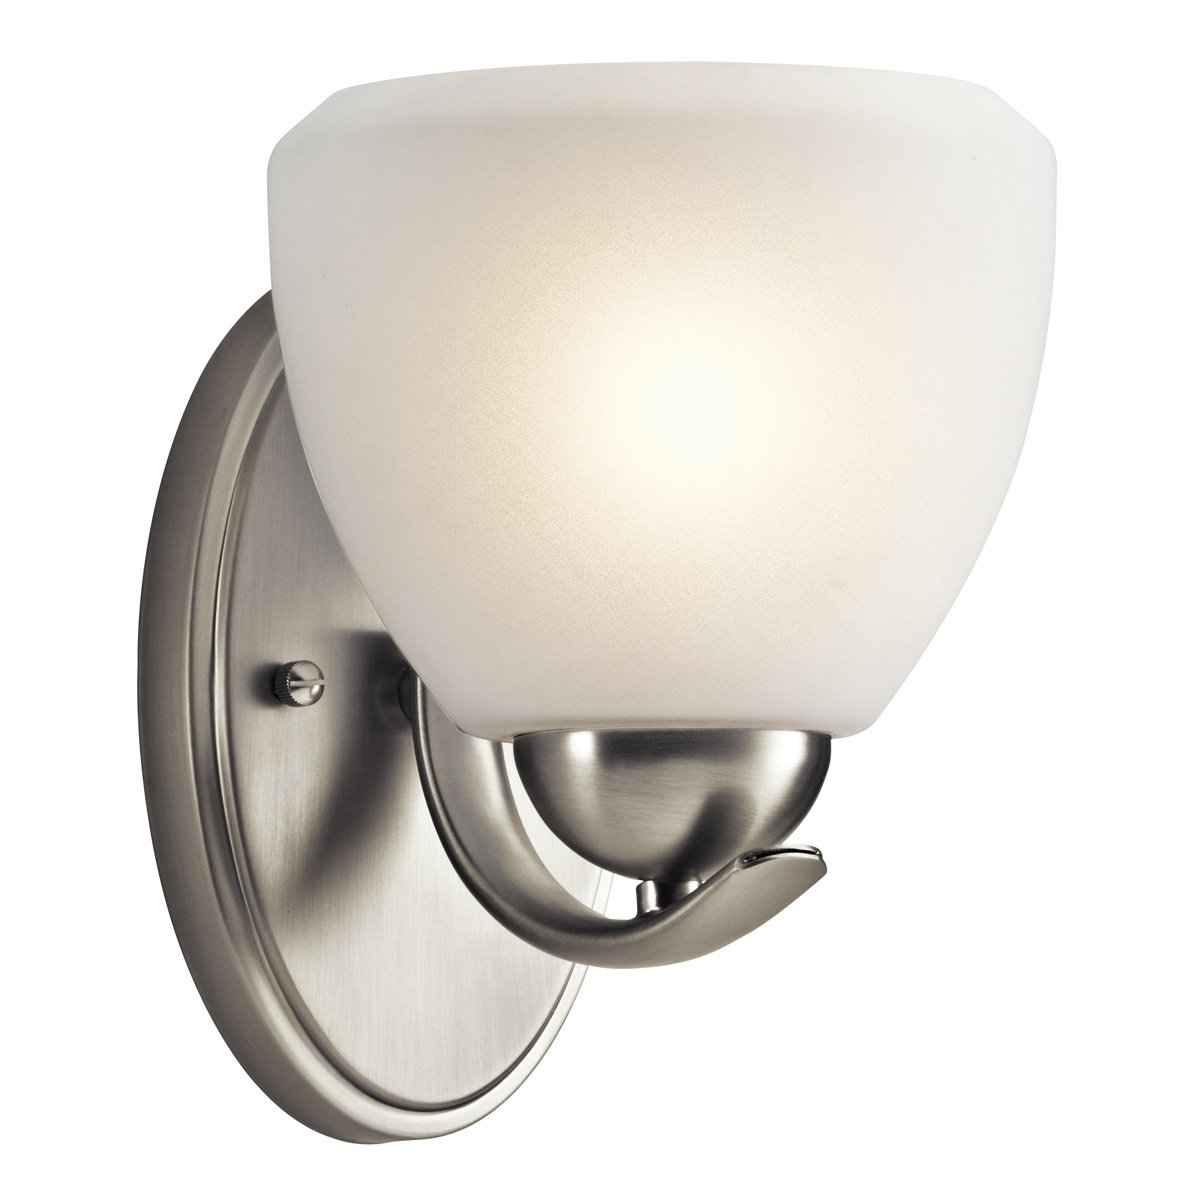 Calleigh 1lt壁取り付け用燭台 1 Light 45117NI 1 B003Y5PKQM 1 Light|つや消しニッケル つや消しニッケル 1 Light